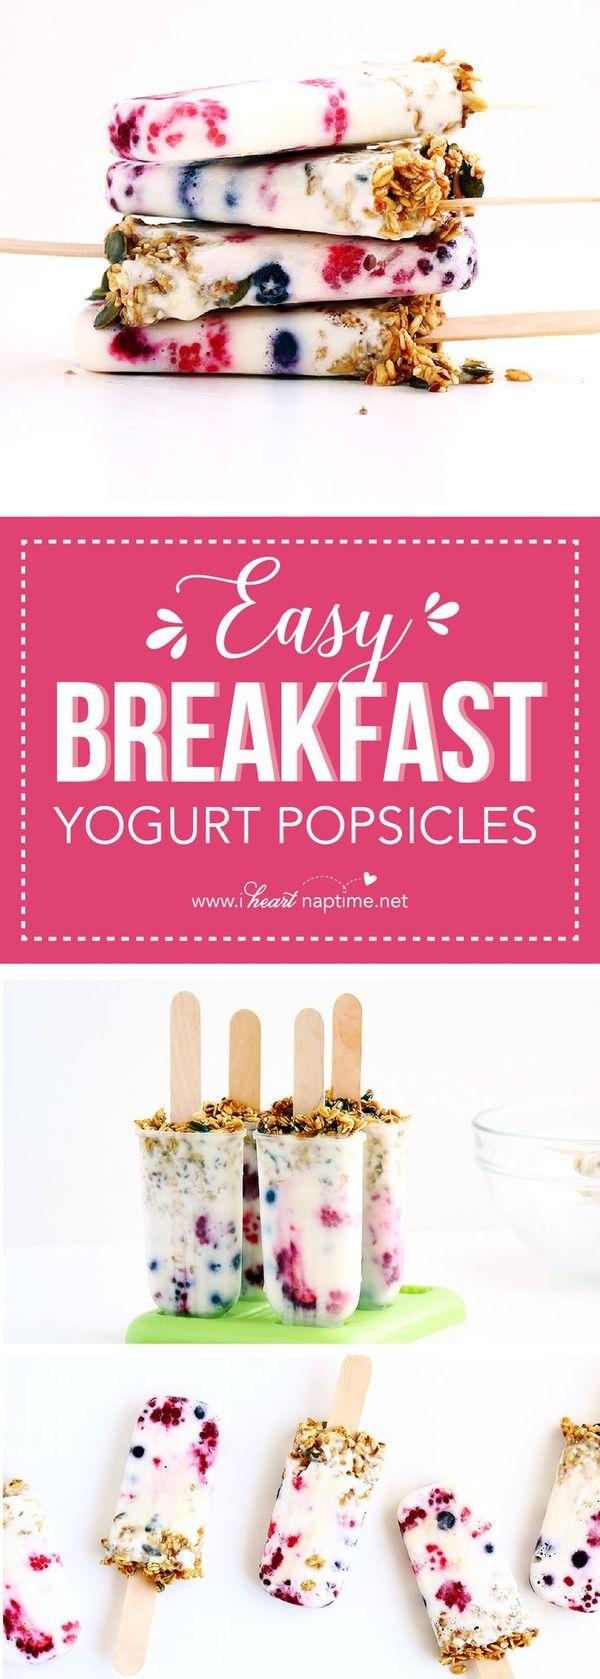 Easy Breakfast Yogurt Popsicles